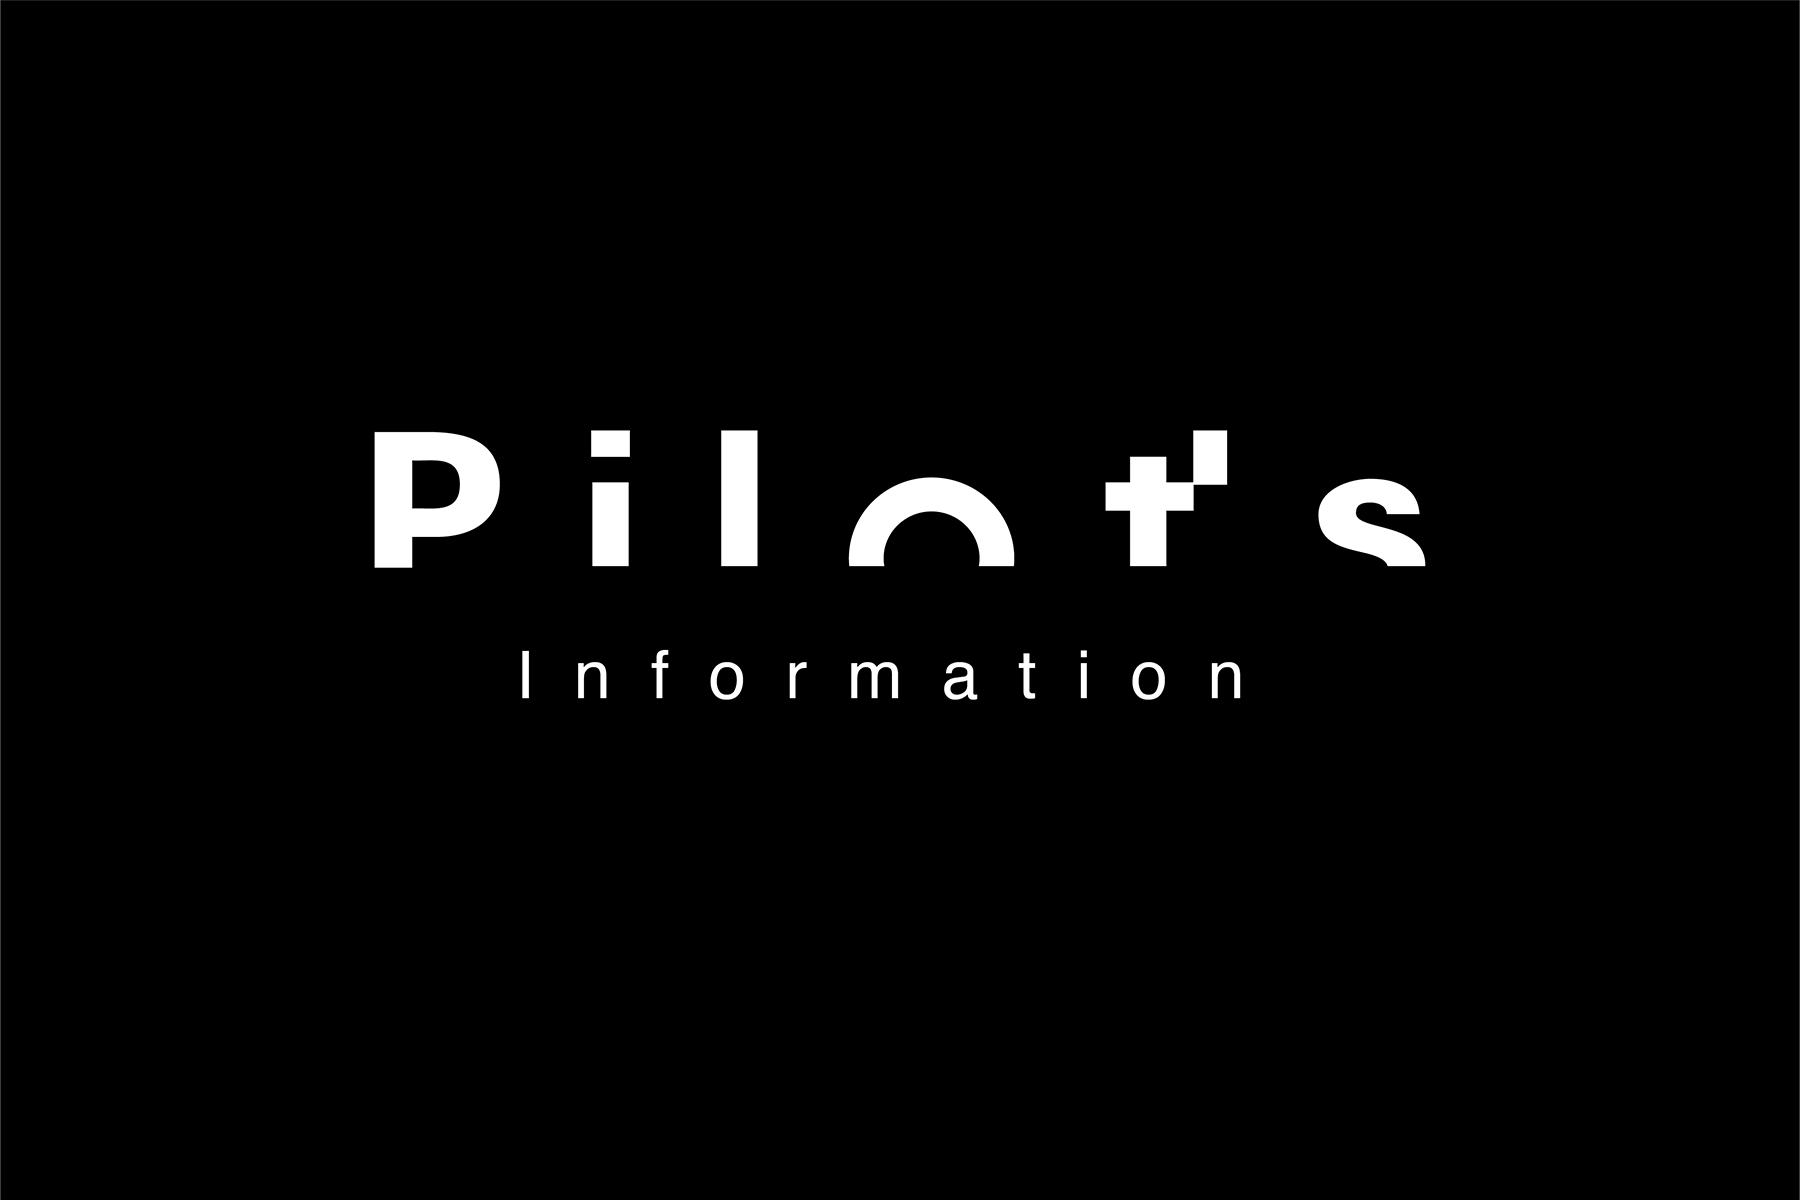 pilots-logo-social-distance